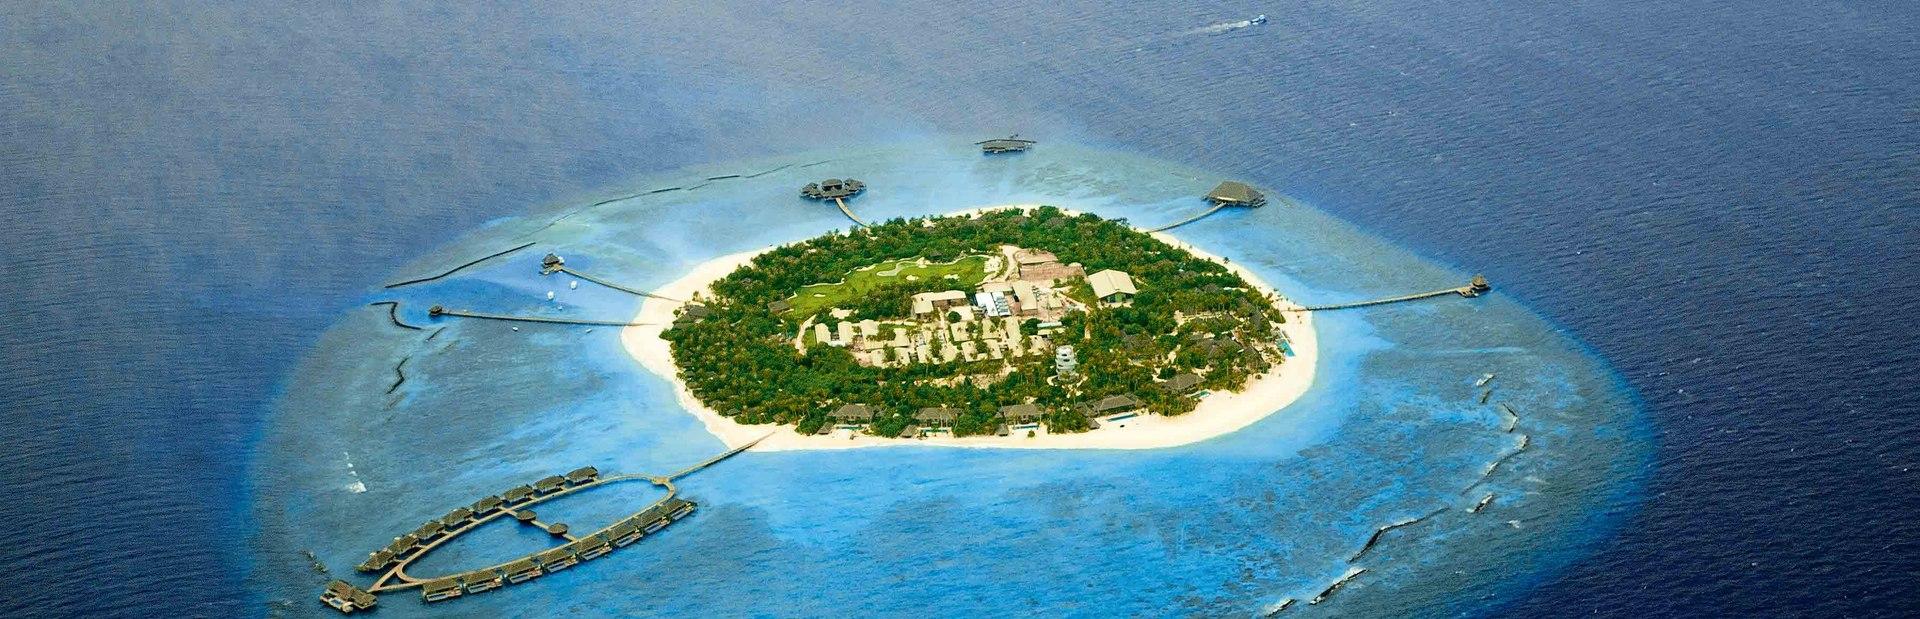 Velaa Private Island Image 1